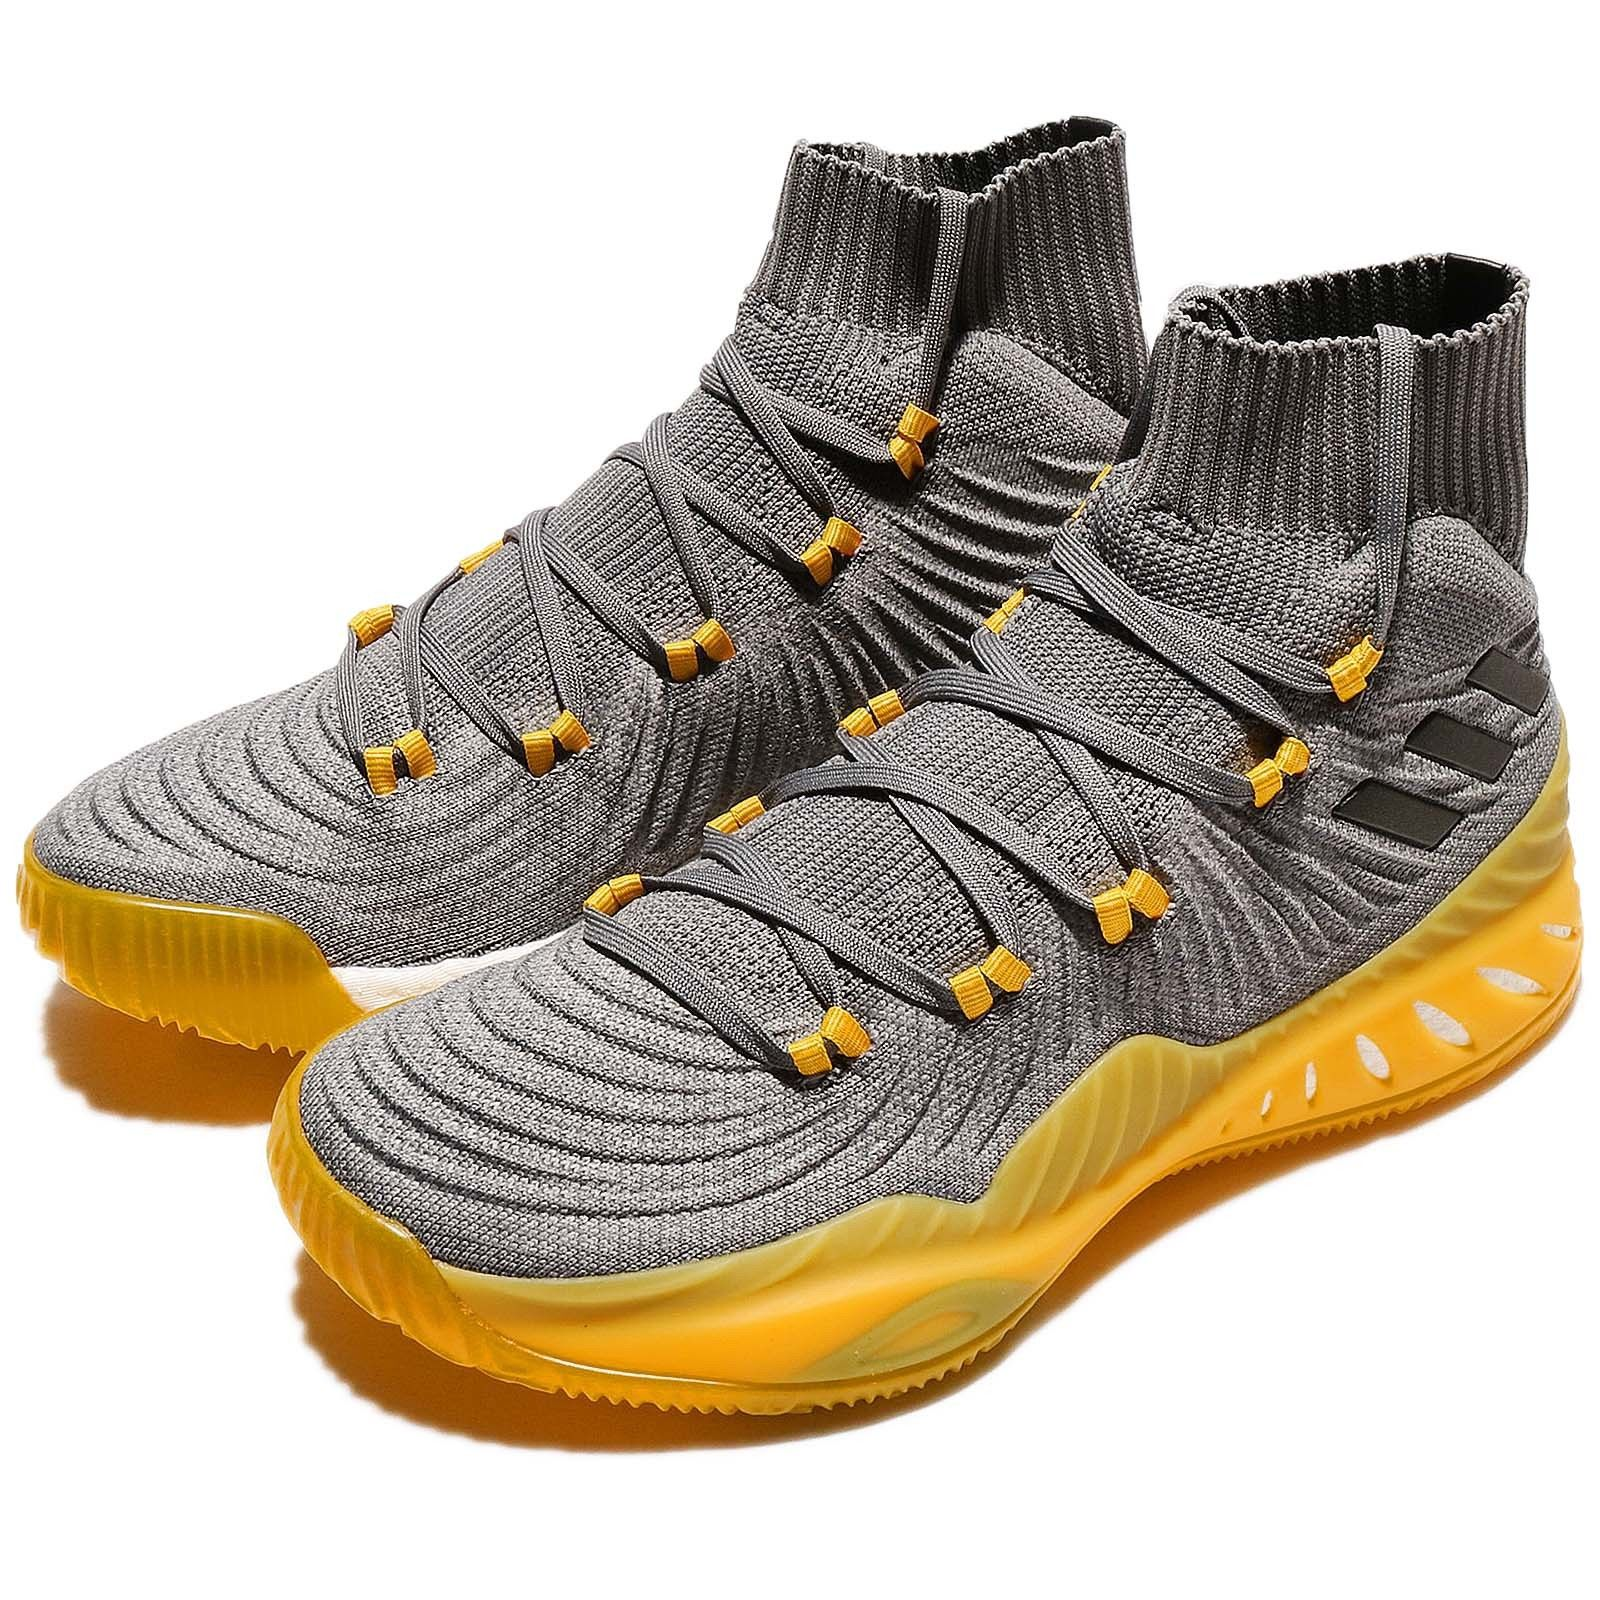 quality design cd7d7 ee885 adidas   Basketball   Kicks On Court   Release Reminder    June 8, 2017 ...